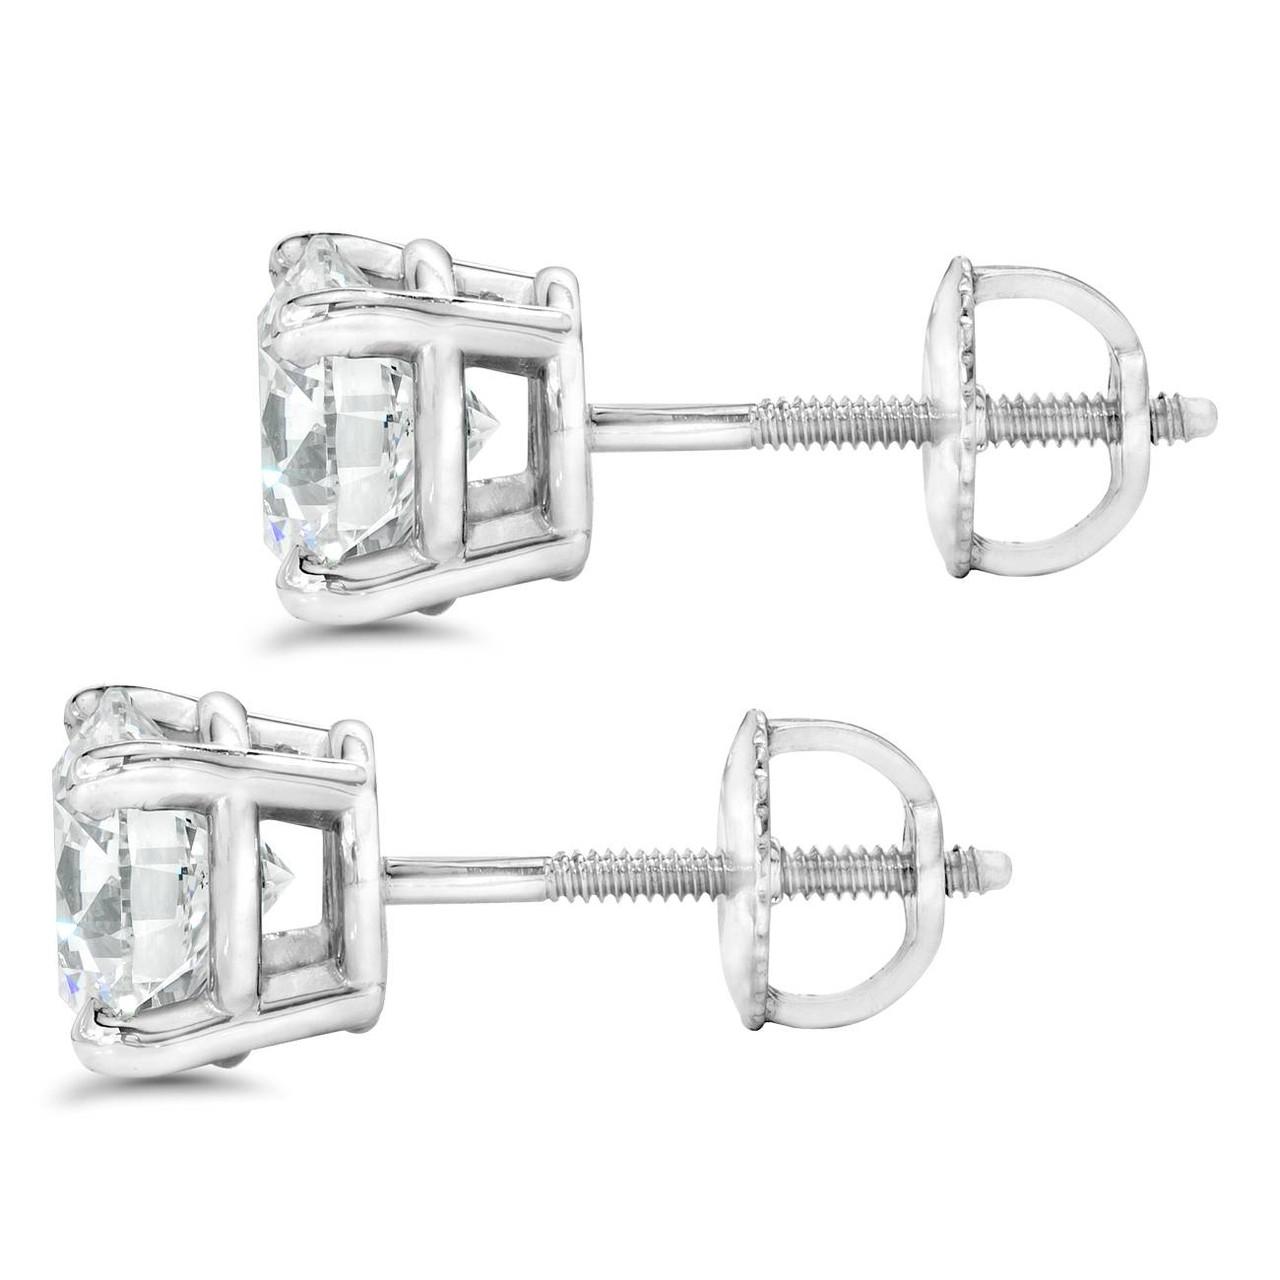 c048d9d8b 1 ct Diamond Studs with Screw Backs 14k White Gold ((G-H), SI(1)-SI(2)).  1ctscrewbackSI.  https://d3d71ba2asa5oz.cloudfront.net/53000589/images/150sbheadon.